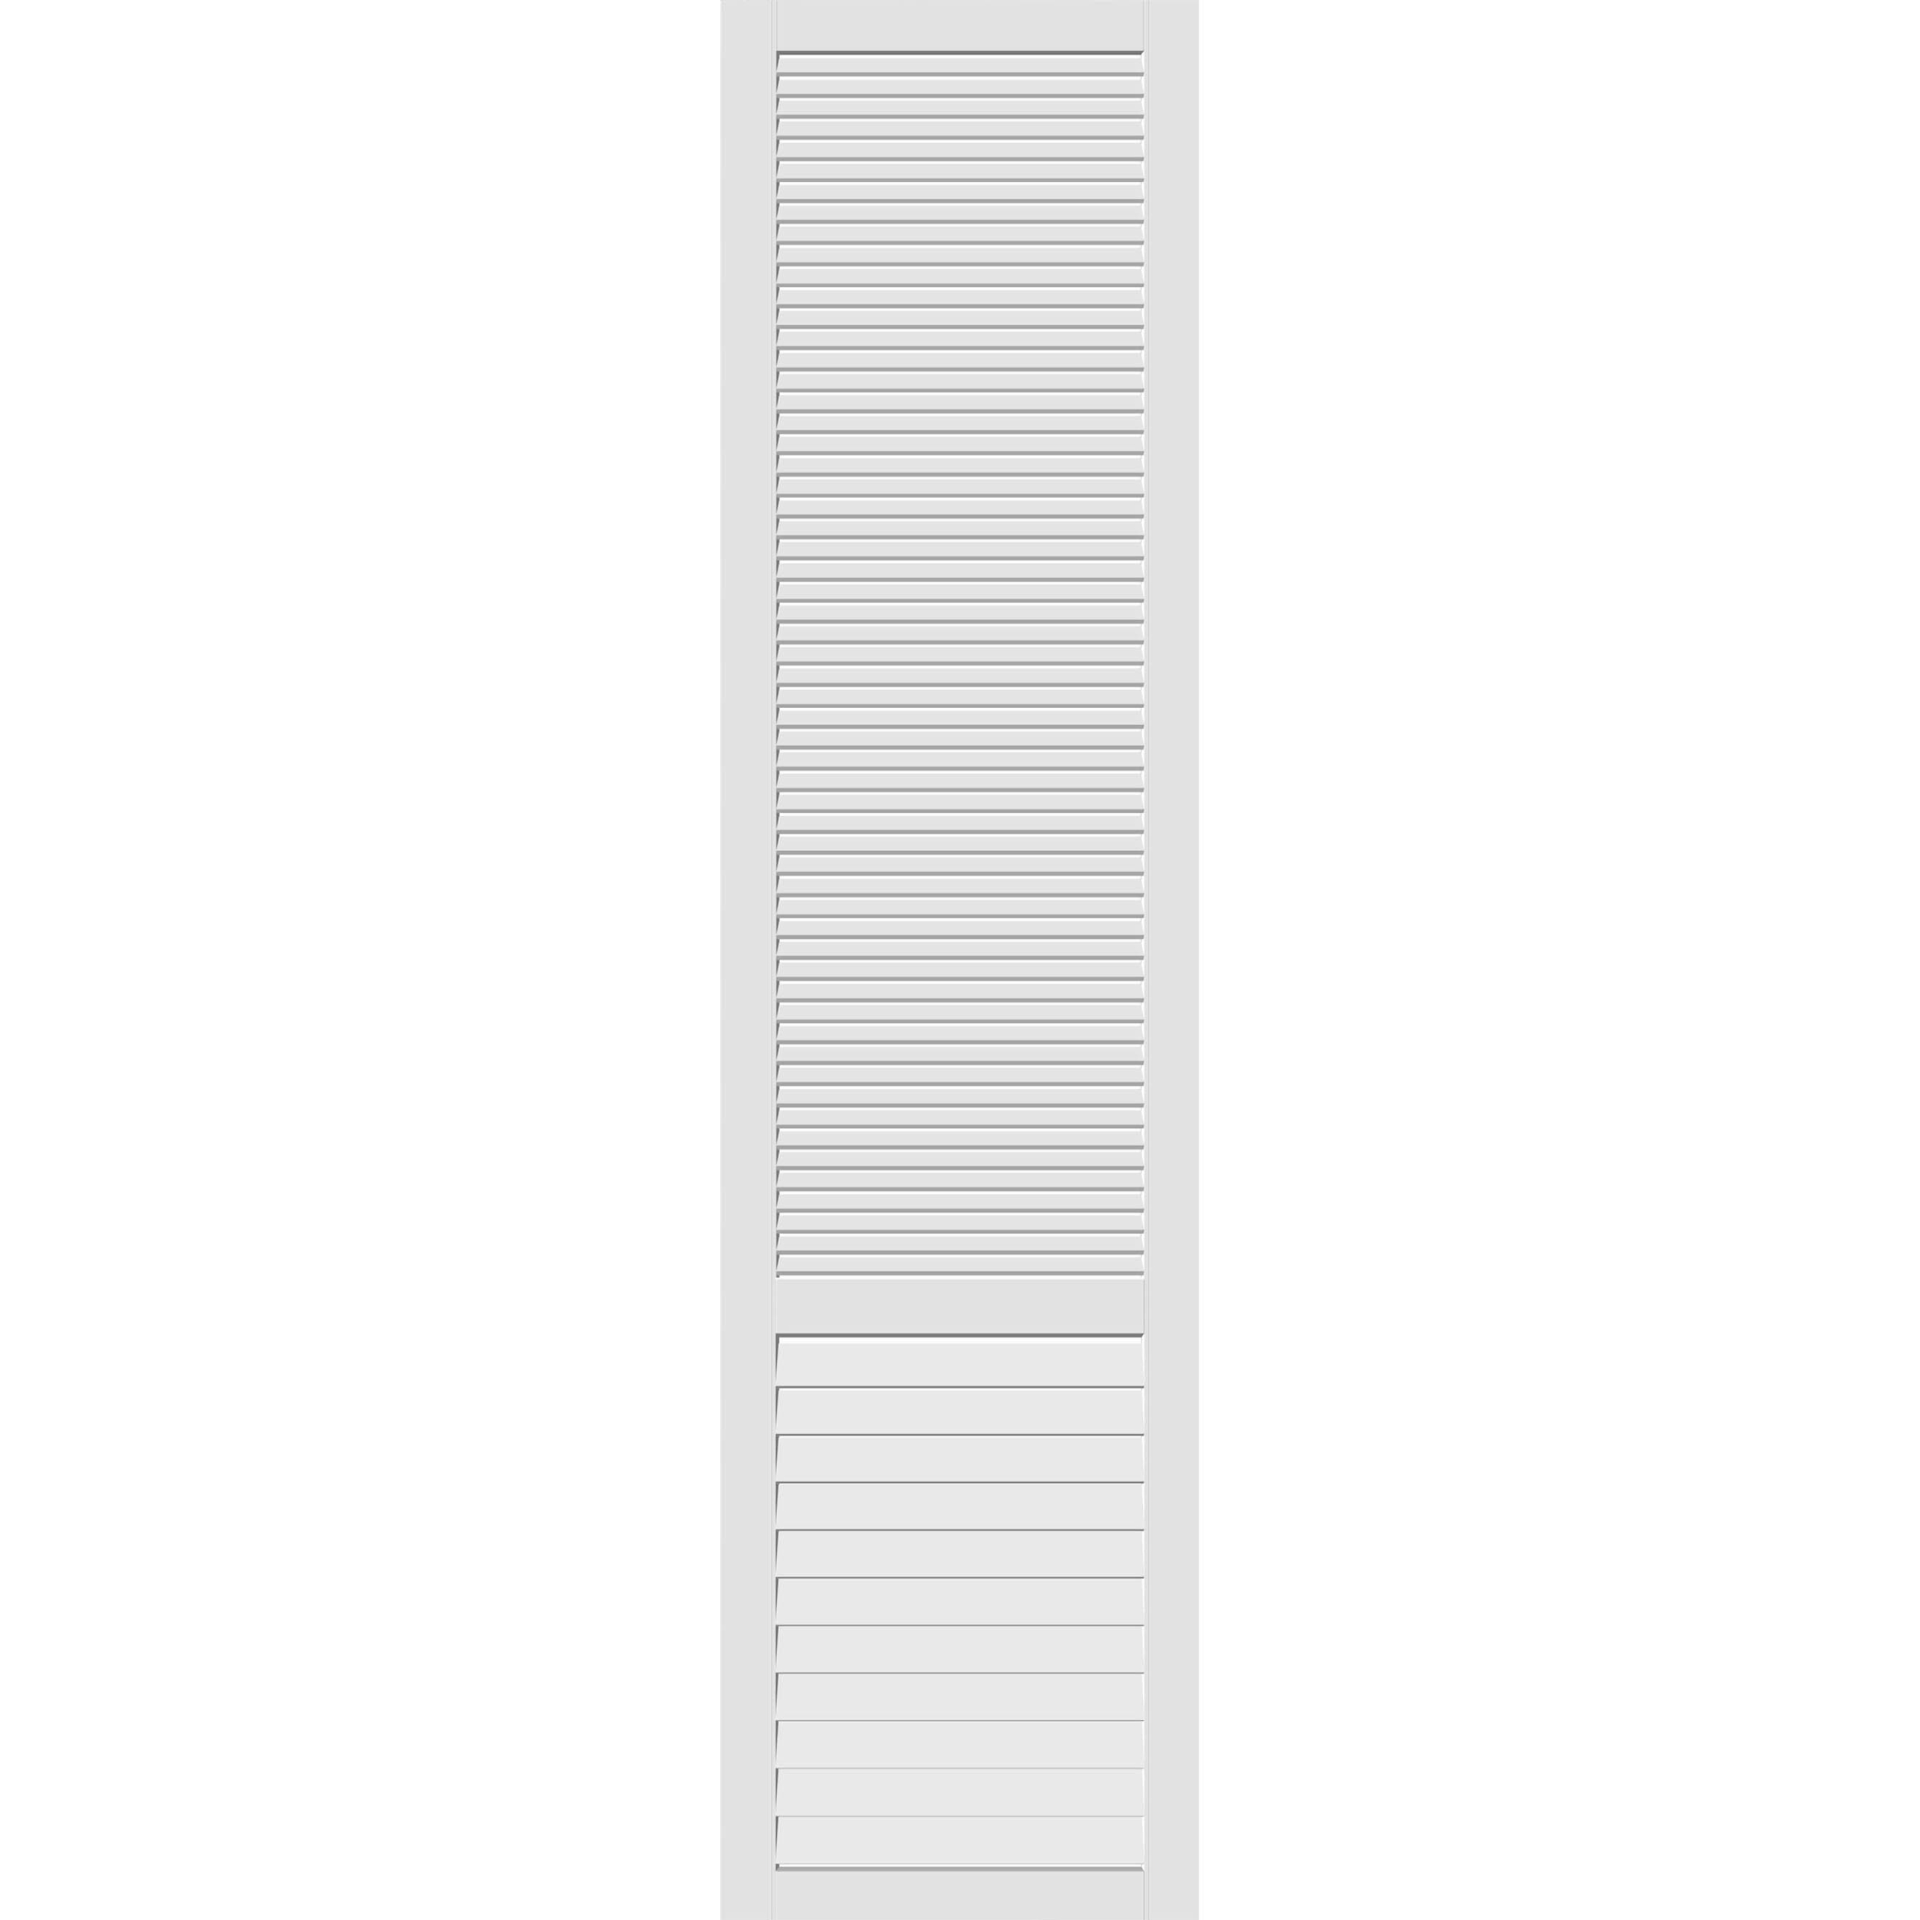 P703-Tall